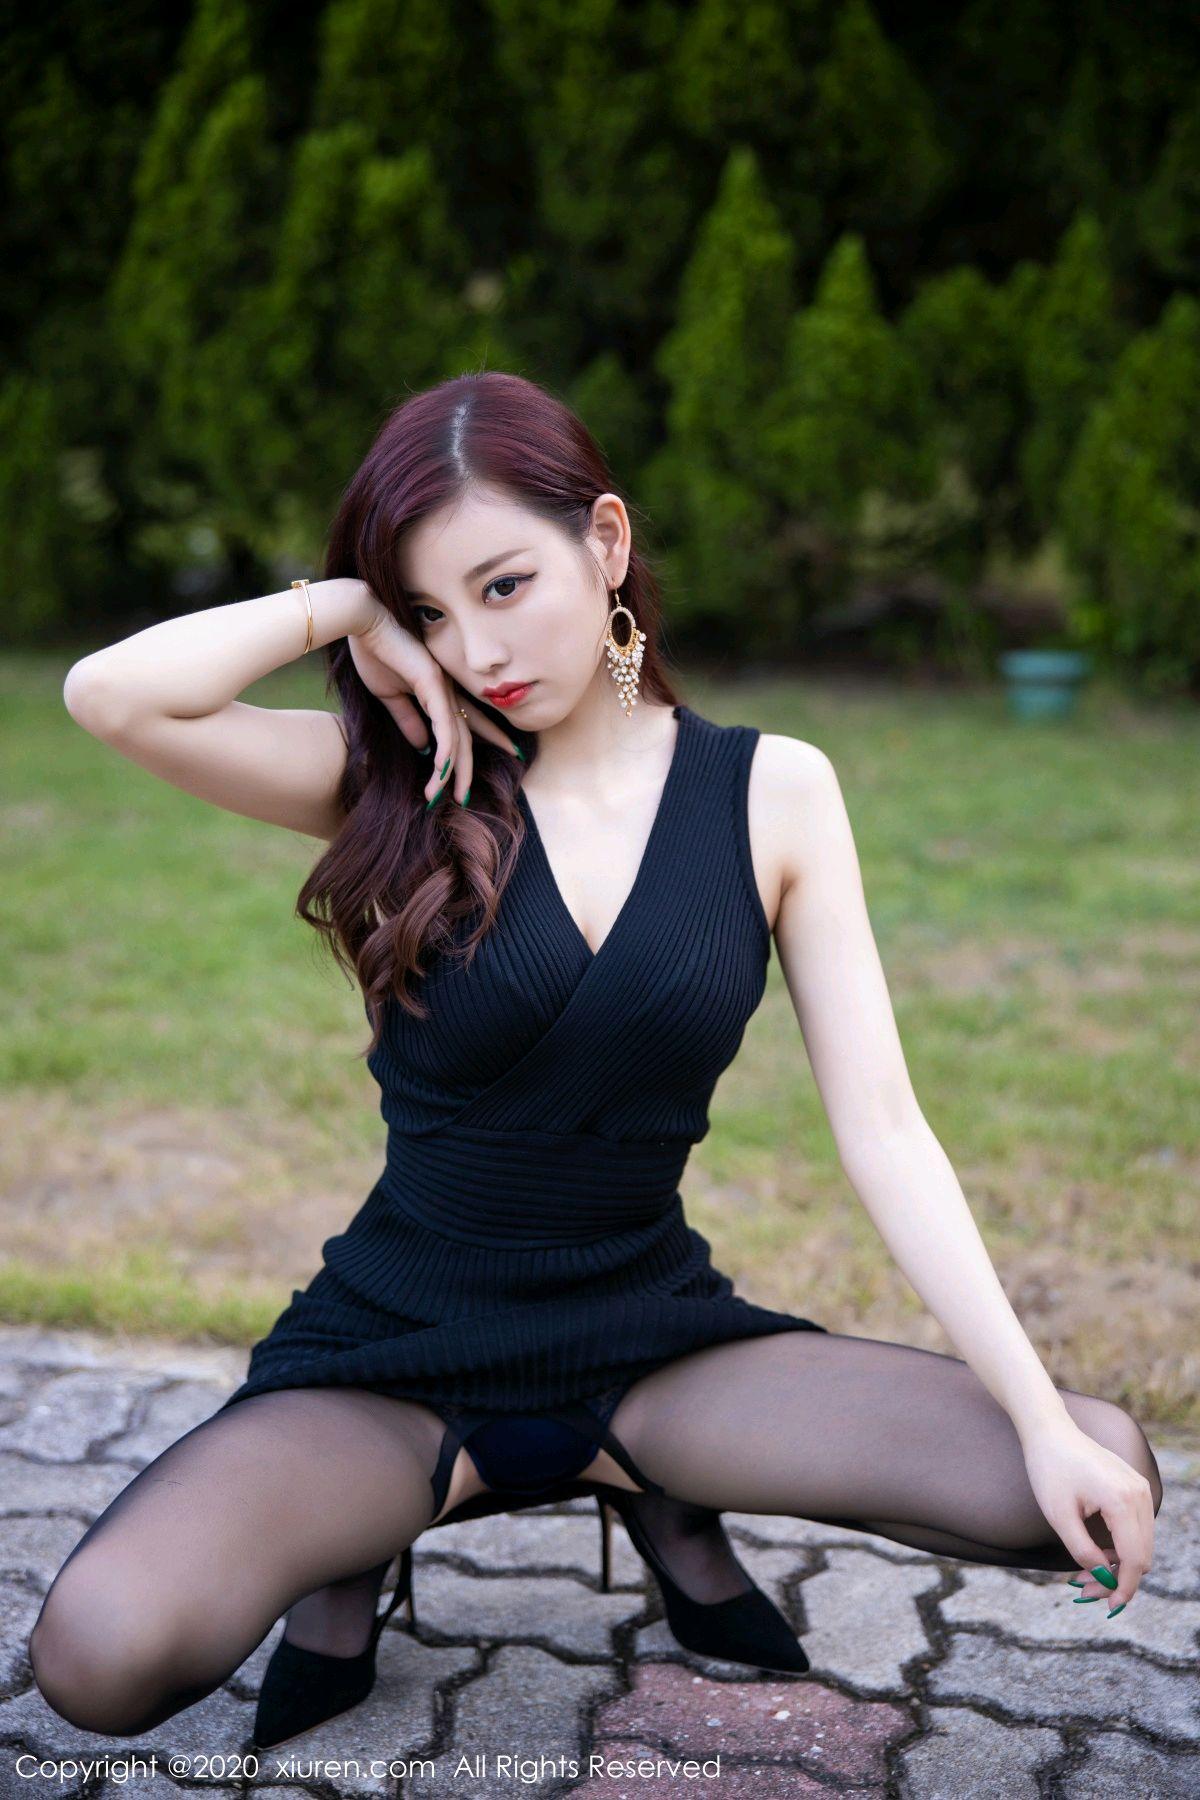 [XiuRen] Vol.2648 Yang Chen Chen 14P, Black Silk, Outdoor, Xiuren, Yang Chen Chen